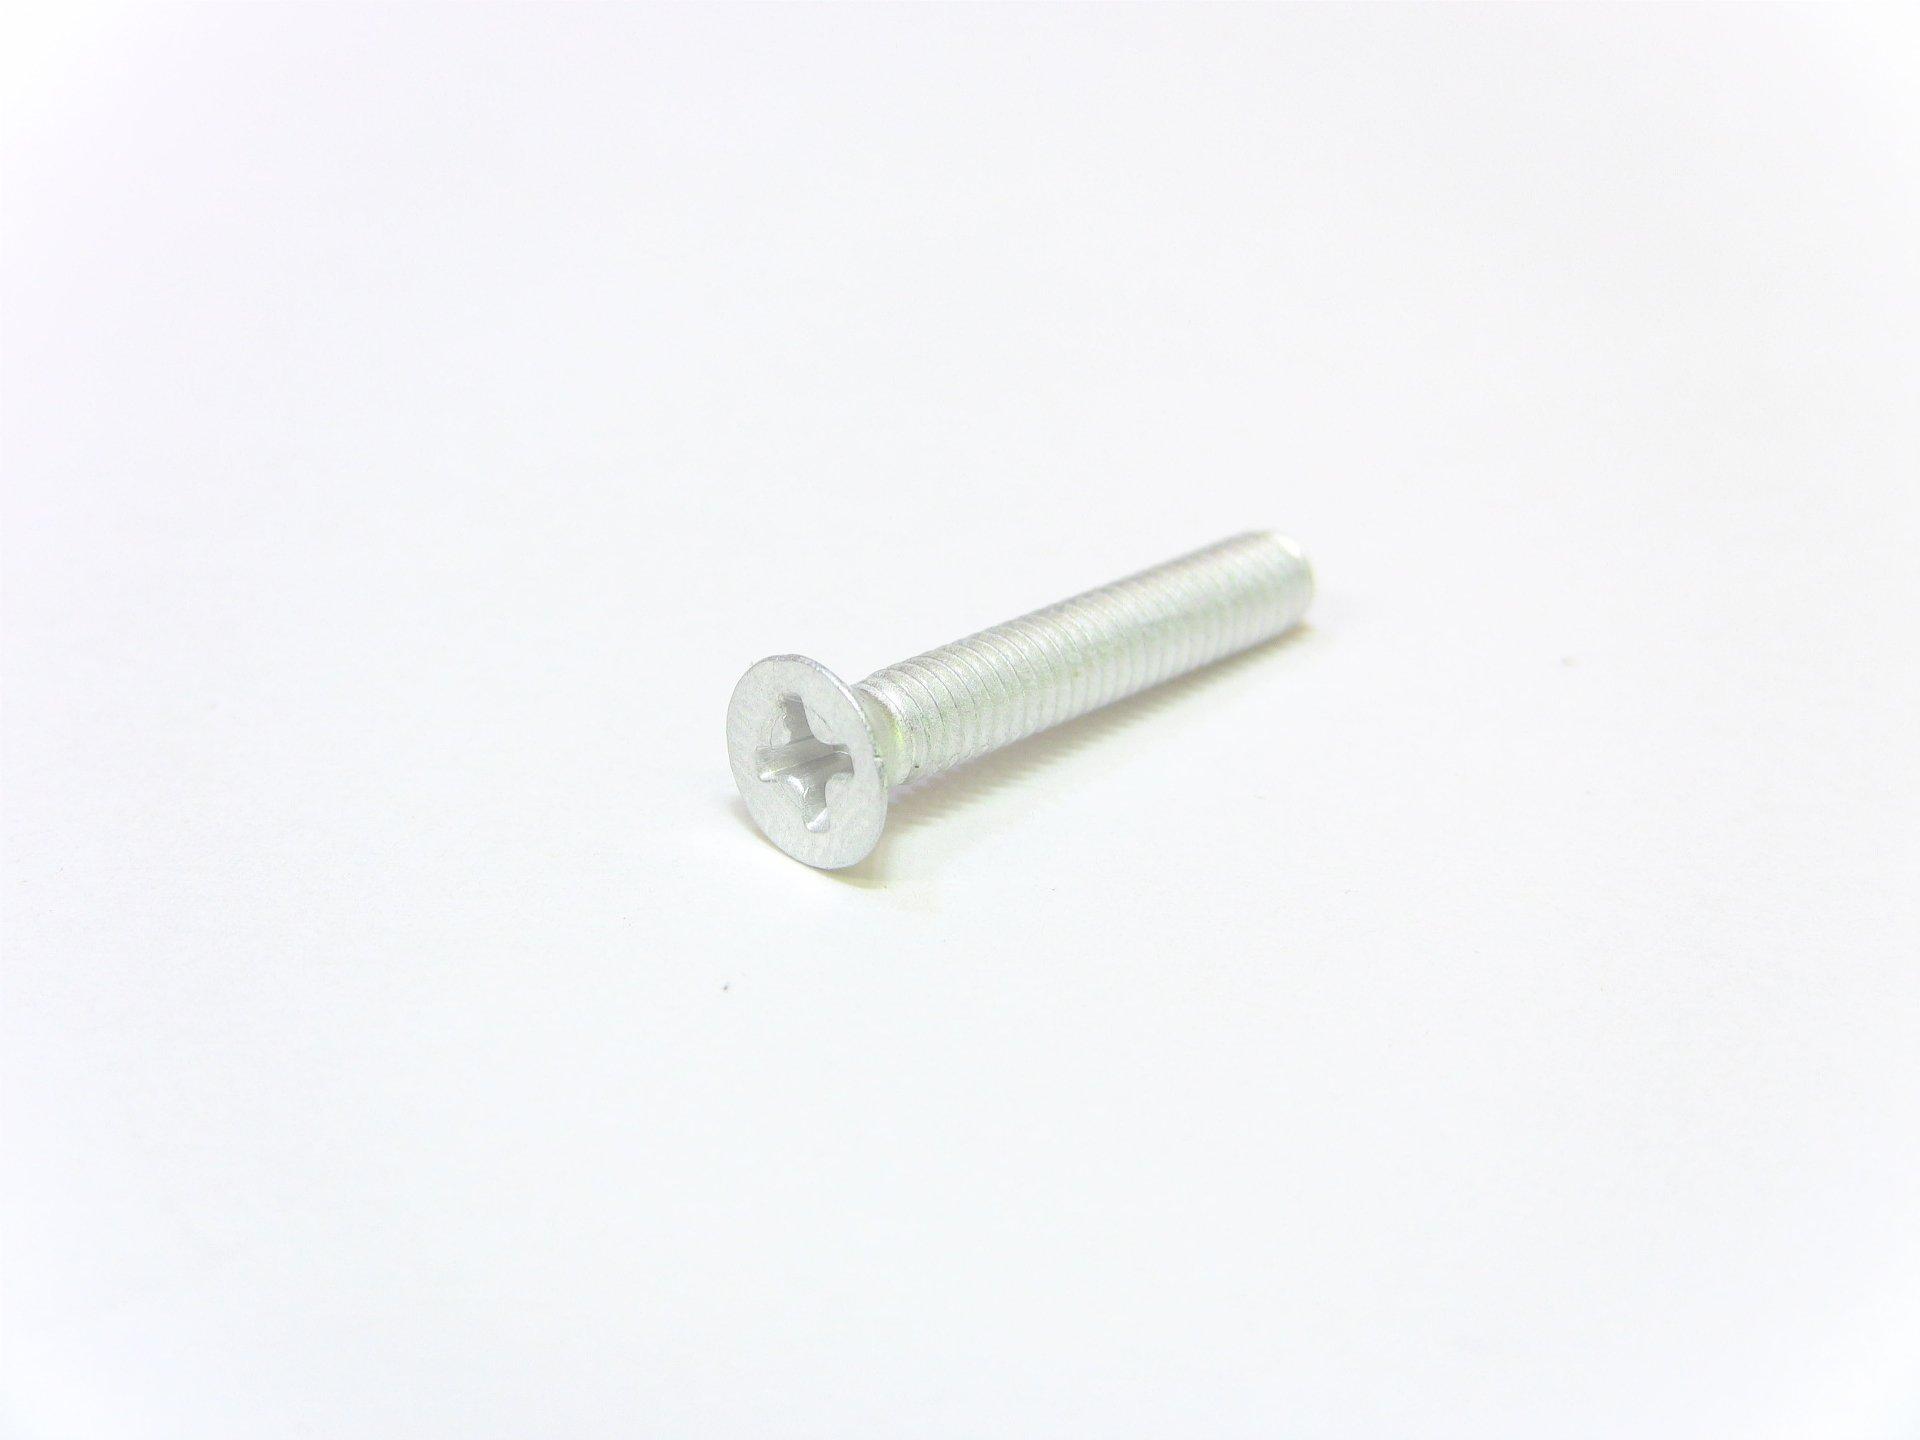 Aluminum Fastener Machine Screw Phillips Flat Head 8 x 32 x 1 in.   UAAC (50pcs)